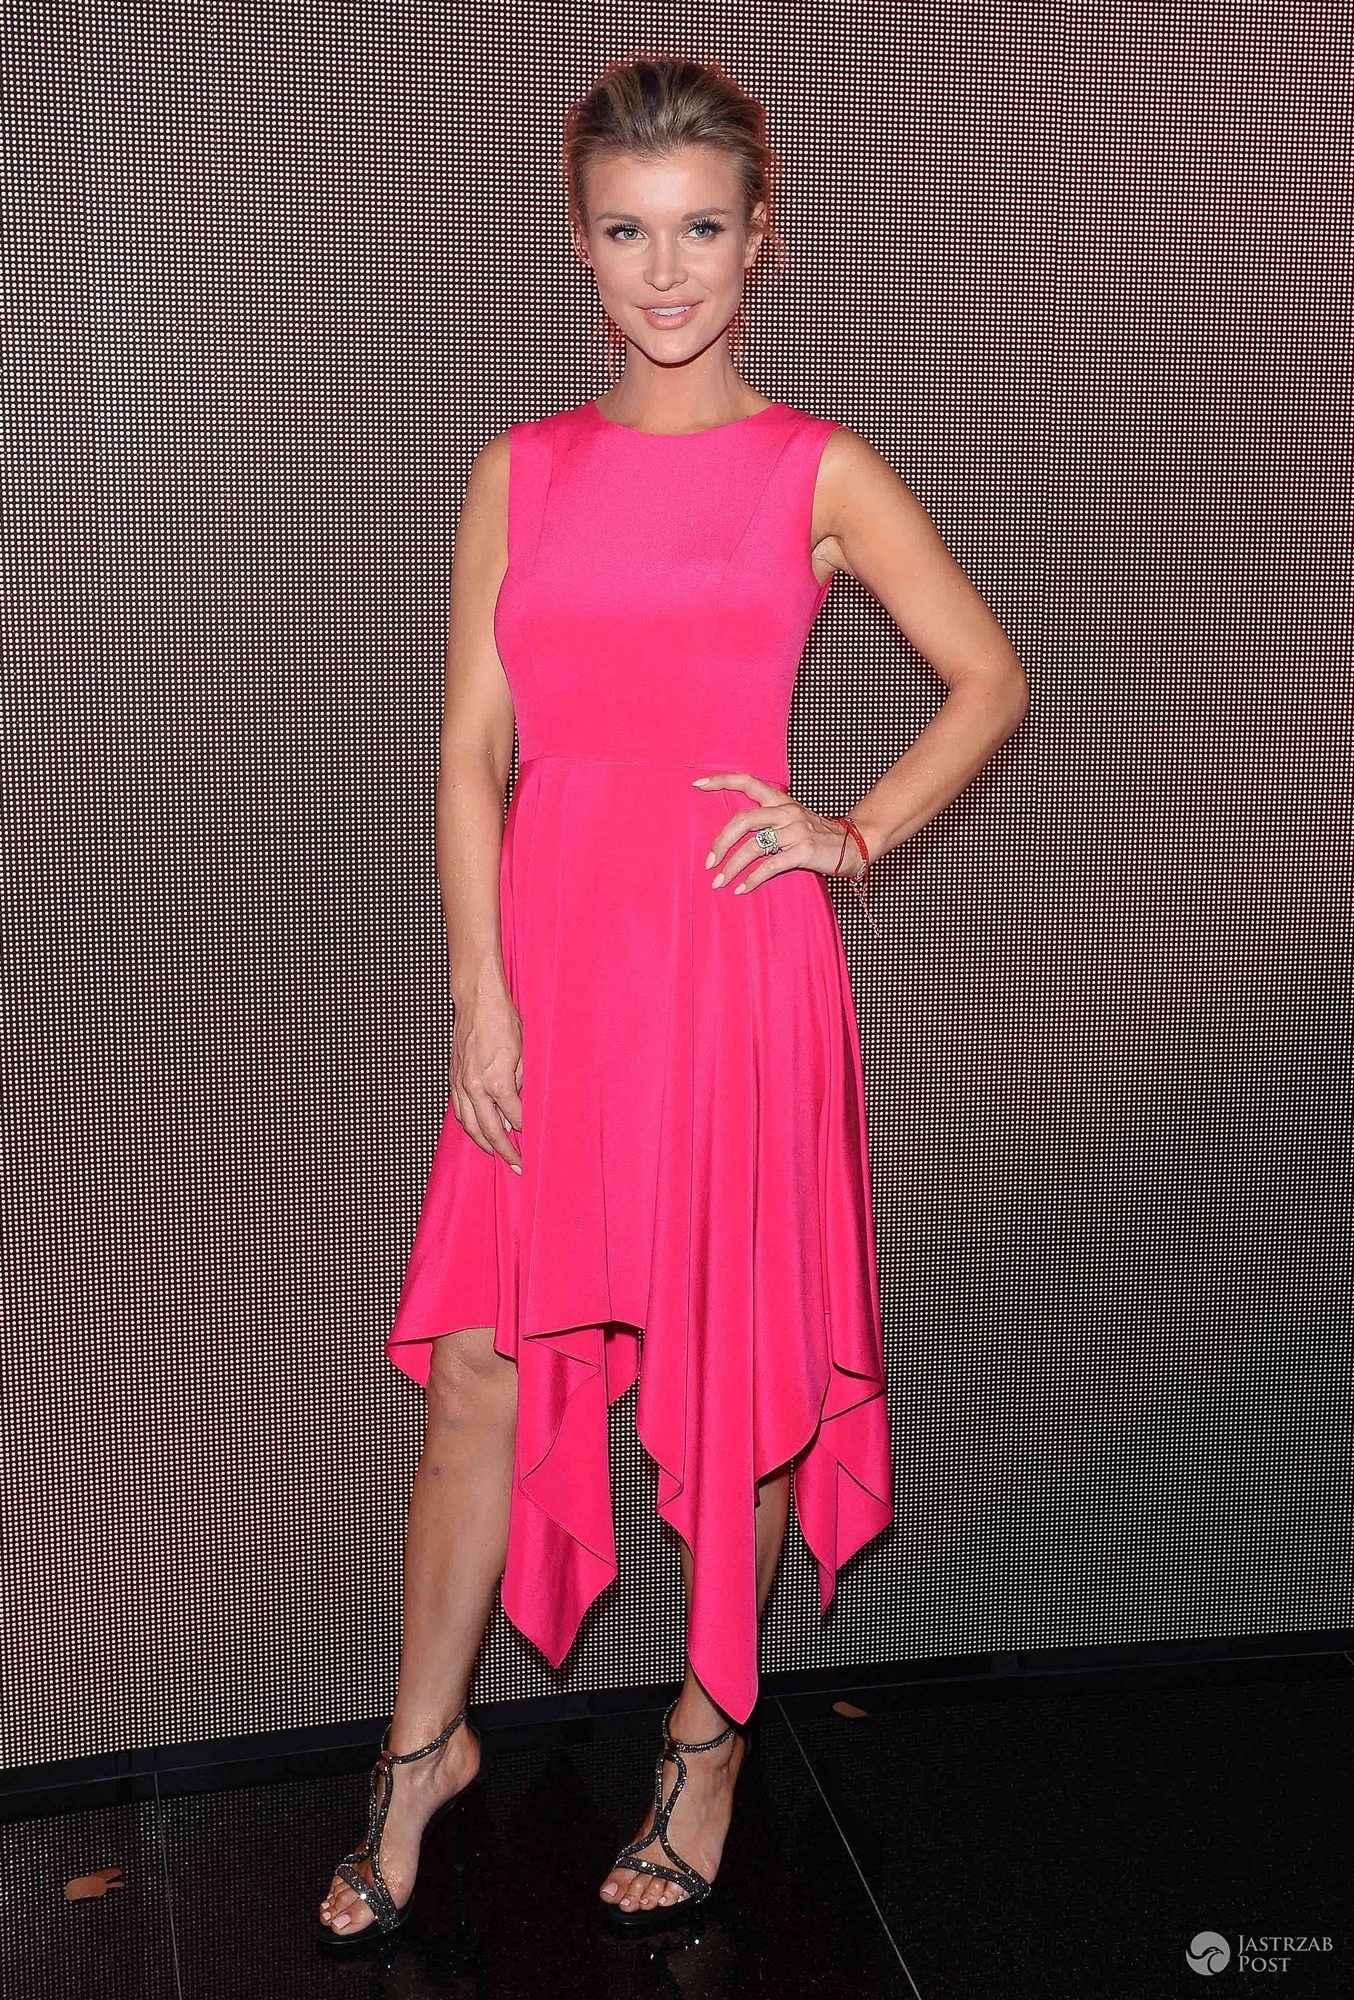 Joanna Krupa na imprezie Magnum w sukience od Bohoboco (fot. ONS)